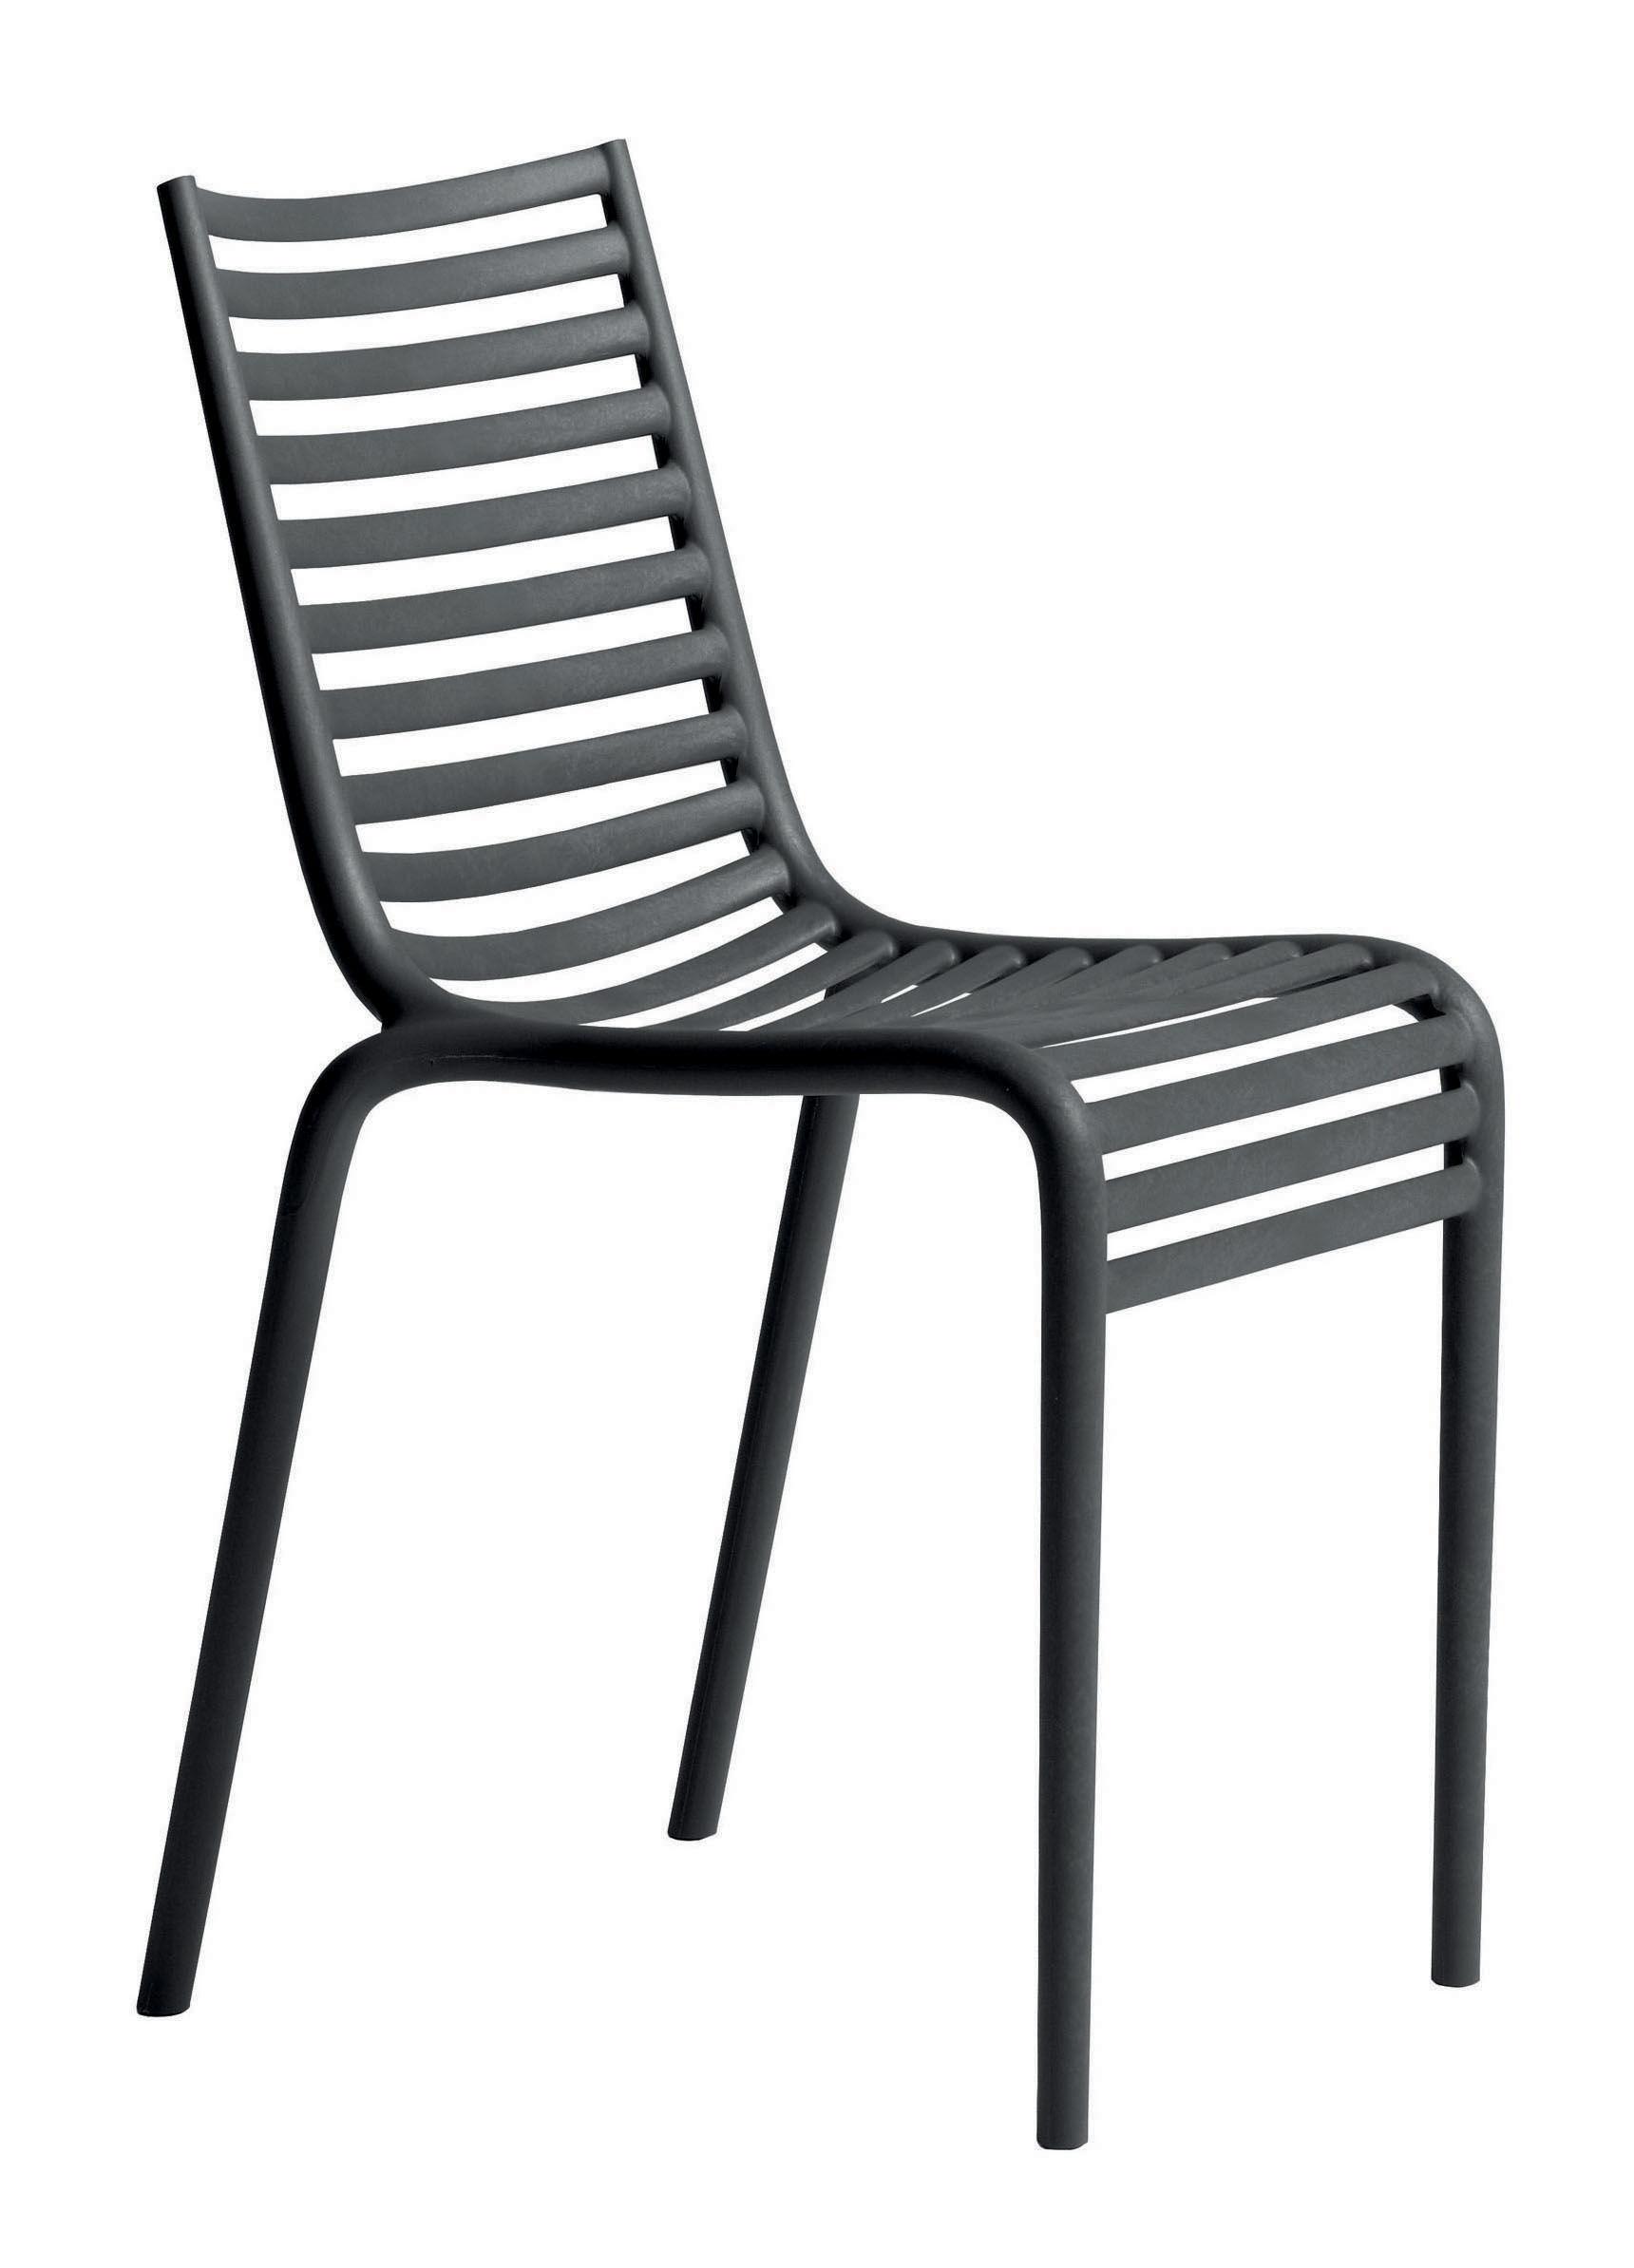 Chaise empilable pip e plastique gris driade made in design for Chaise empilable plastique